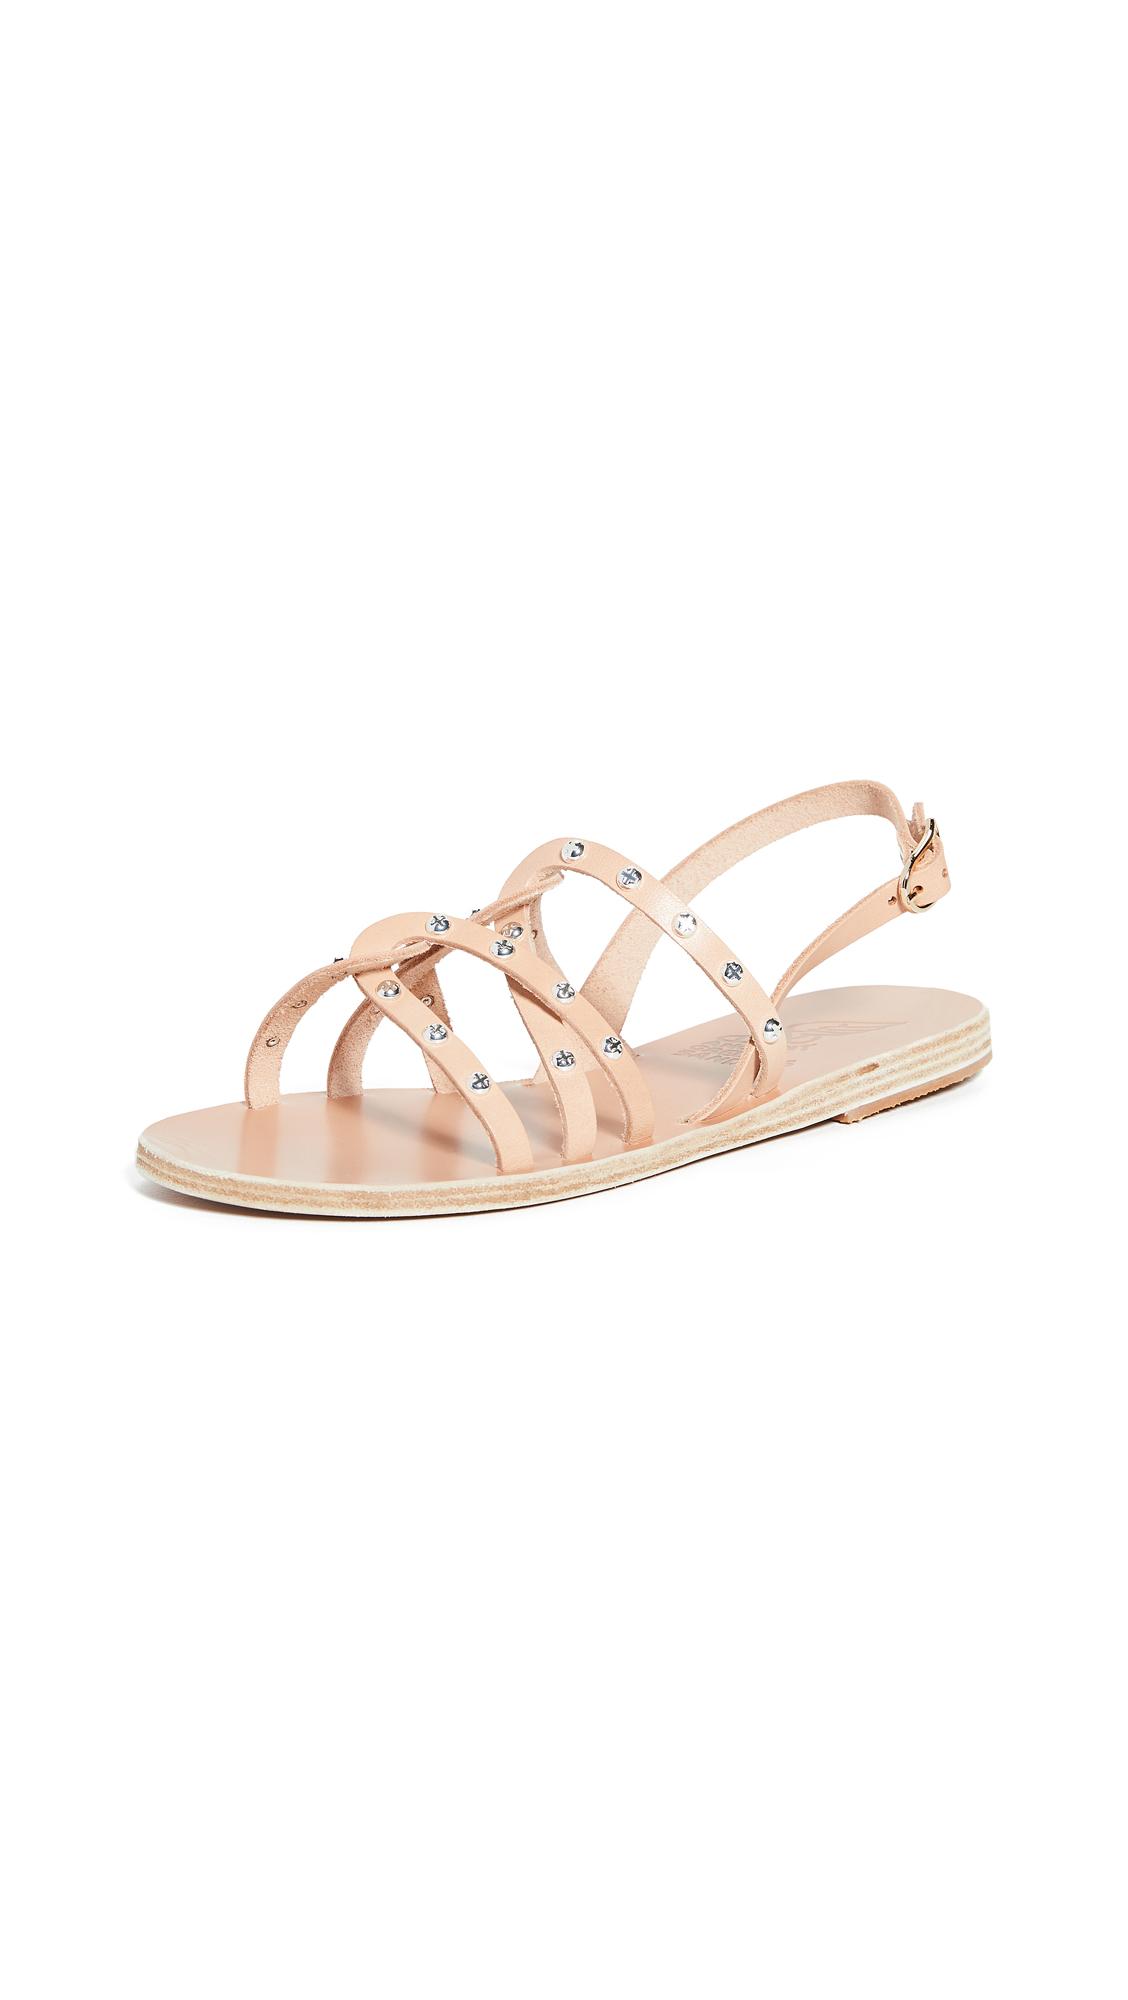 Buy Ancient Greek Sandals Schinousa Rivets Sandals online, shop Ancient Greek Sandals